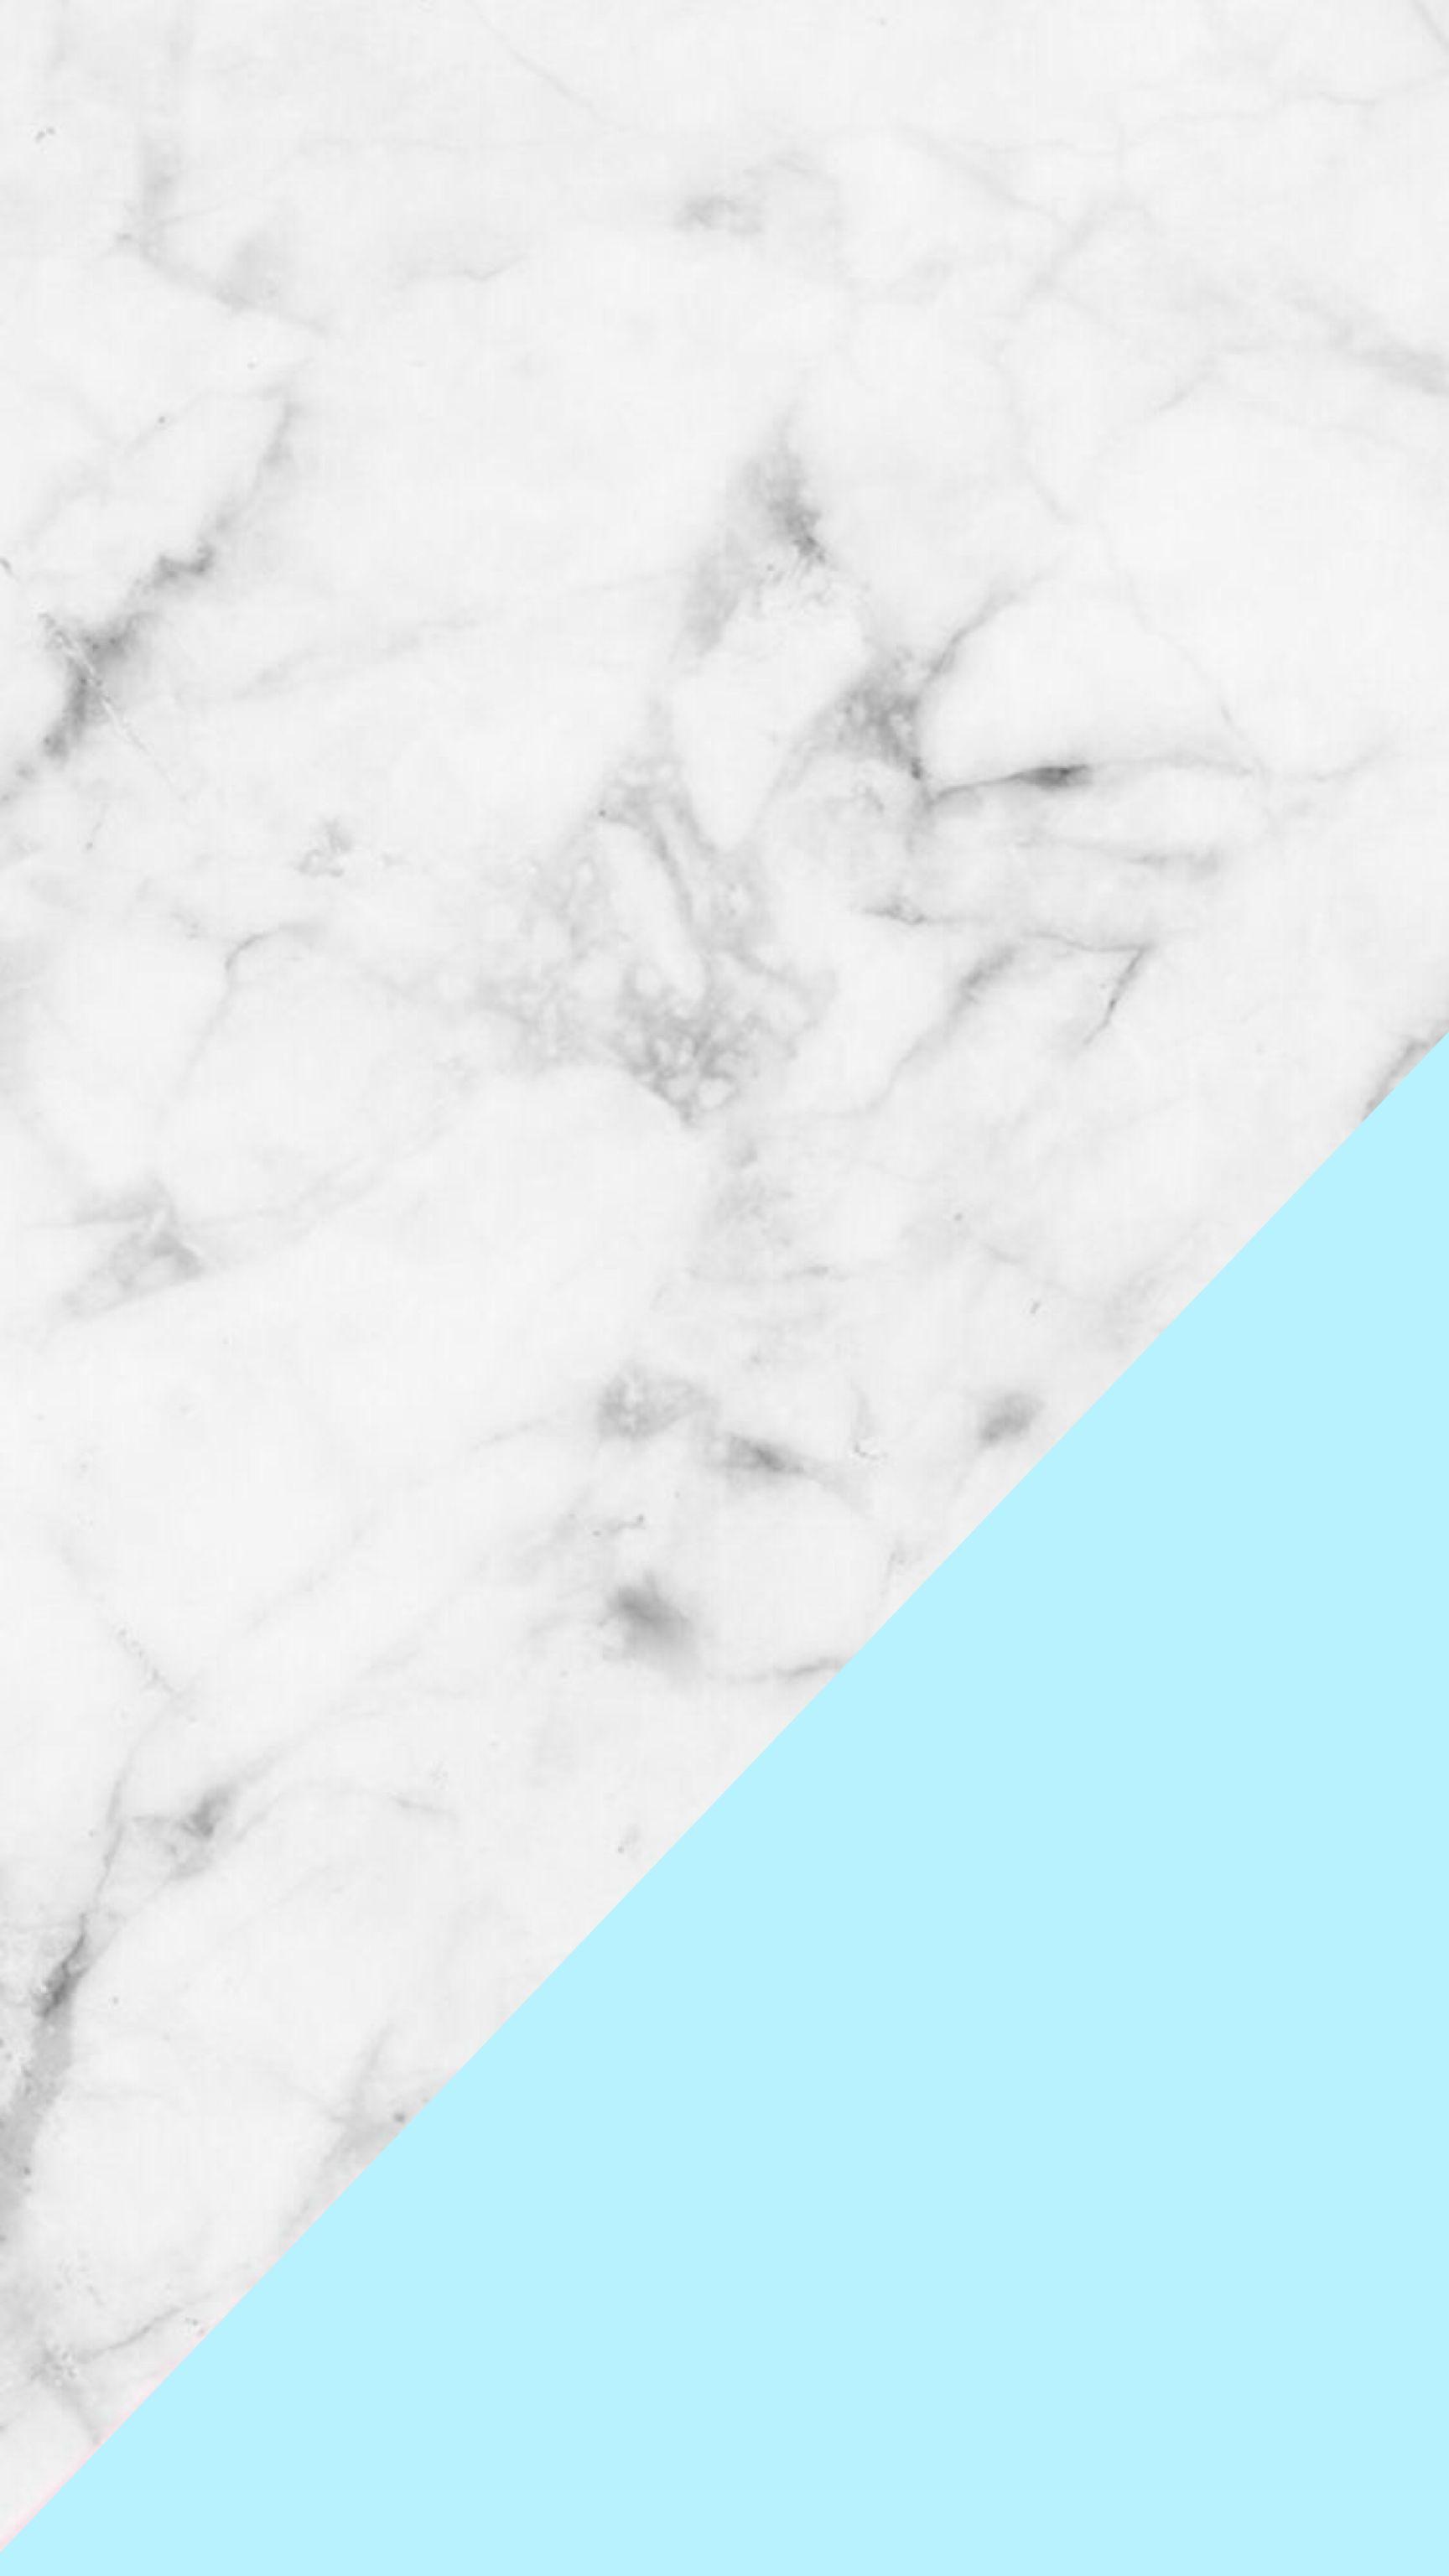 Pingl par girlyy nerd sur wallpaper planners for Fond ecran mignon